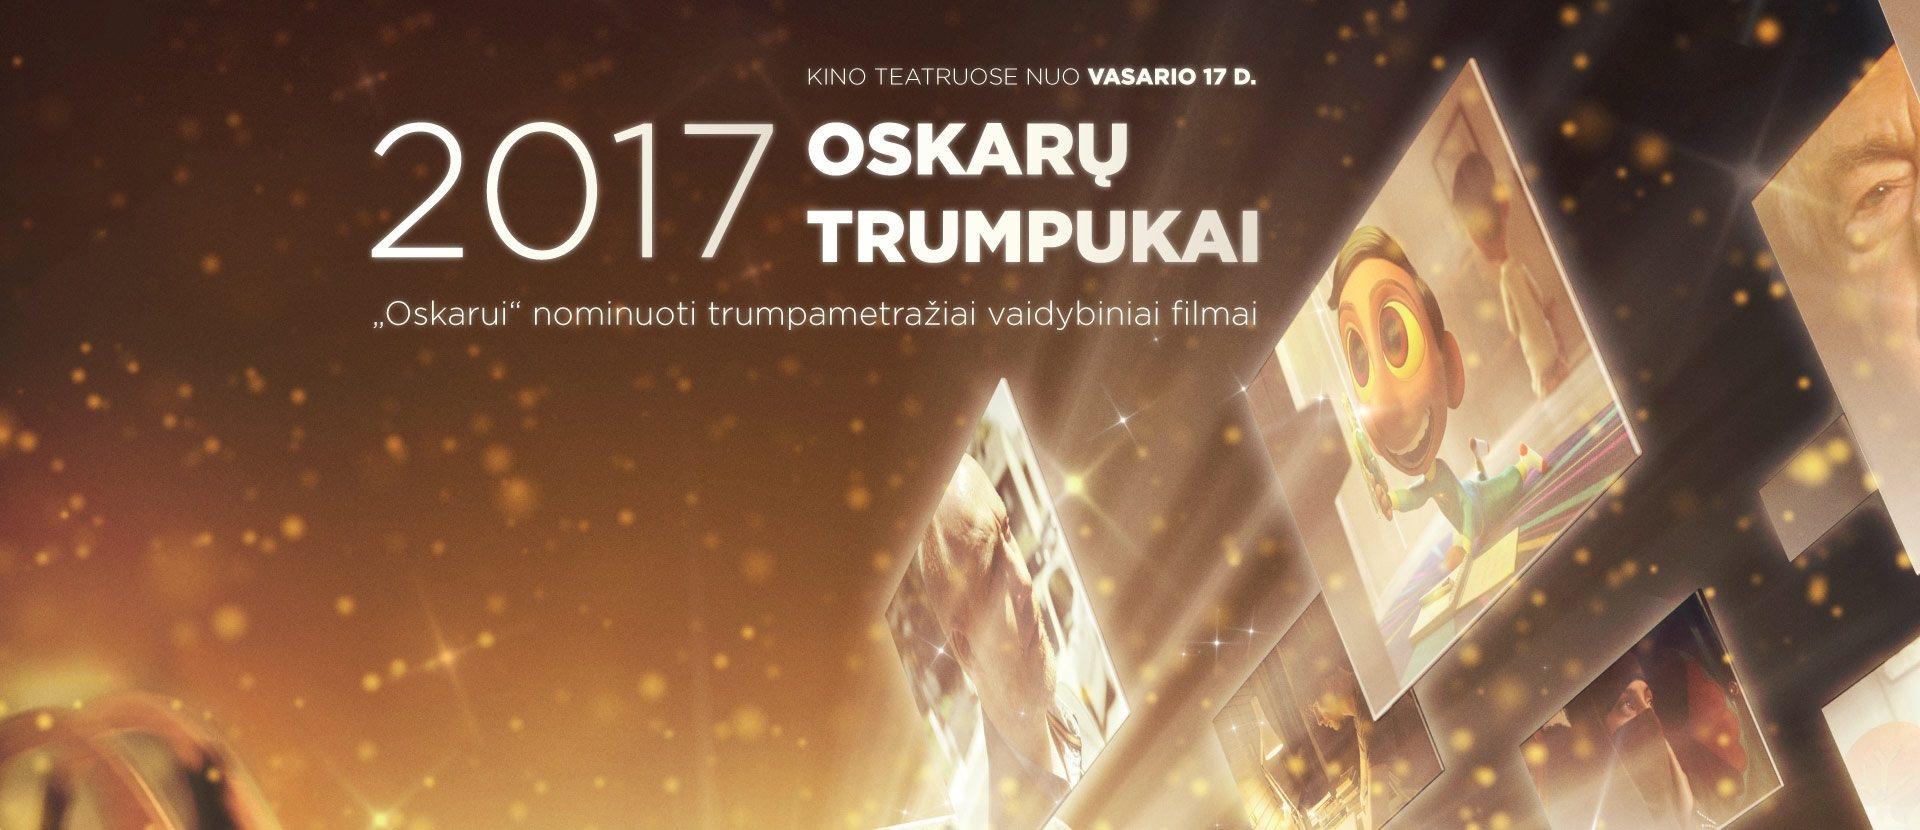 Oskarų trumpukai 2017 PREMJERA